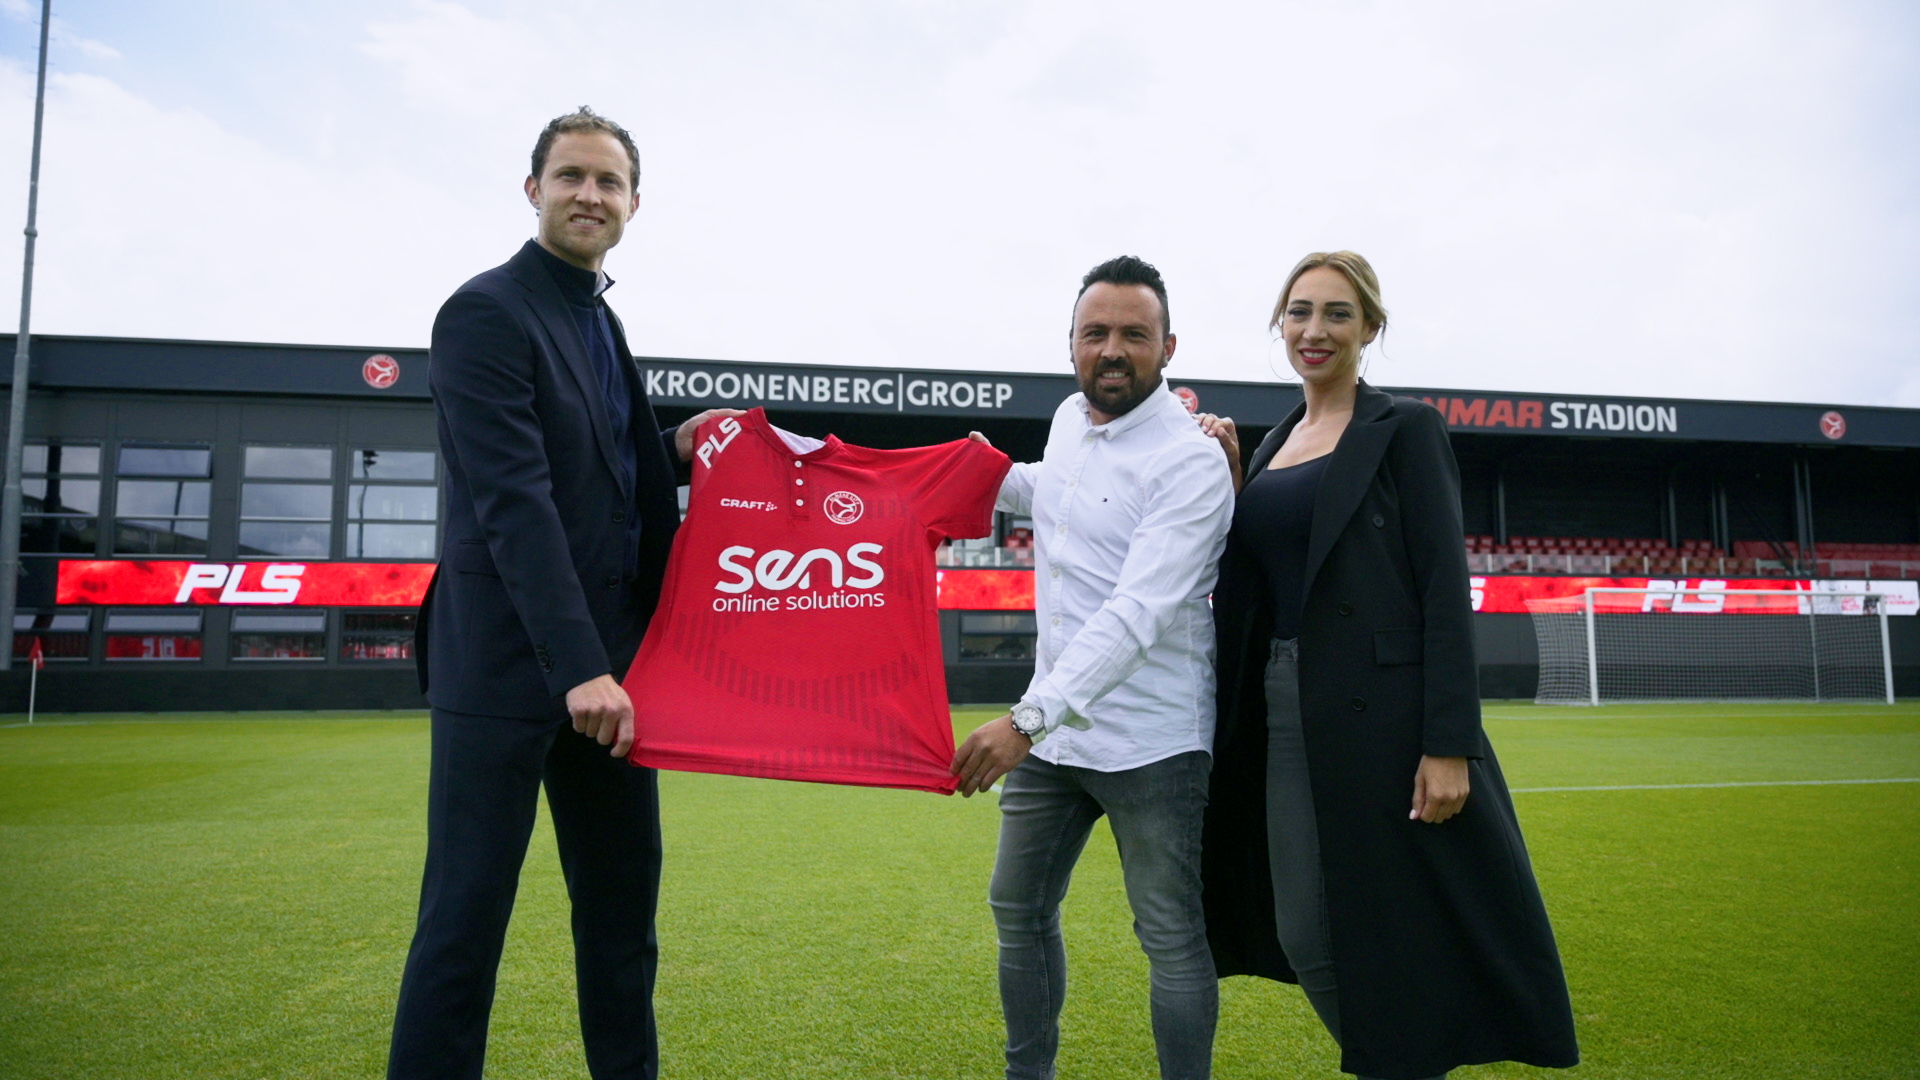 PLS bezorgt Almere City FC tv-gerichte tweede ring LED-boarding